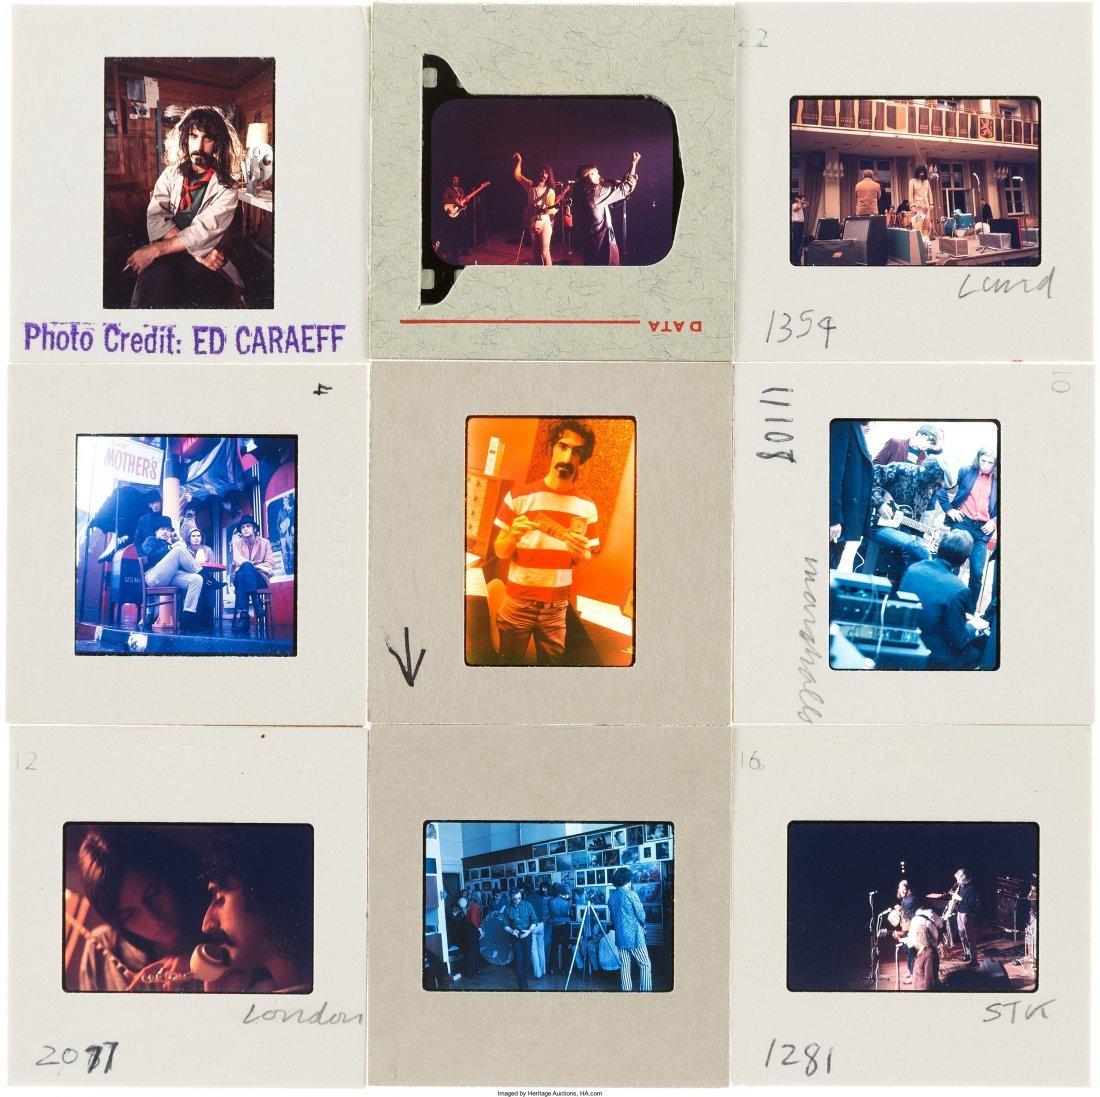 89578: Frank Zappa - Set of Fifty Color Photo Slides (L - 3